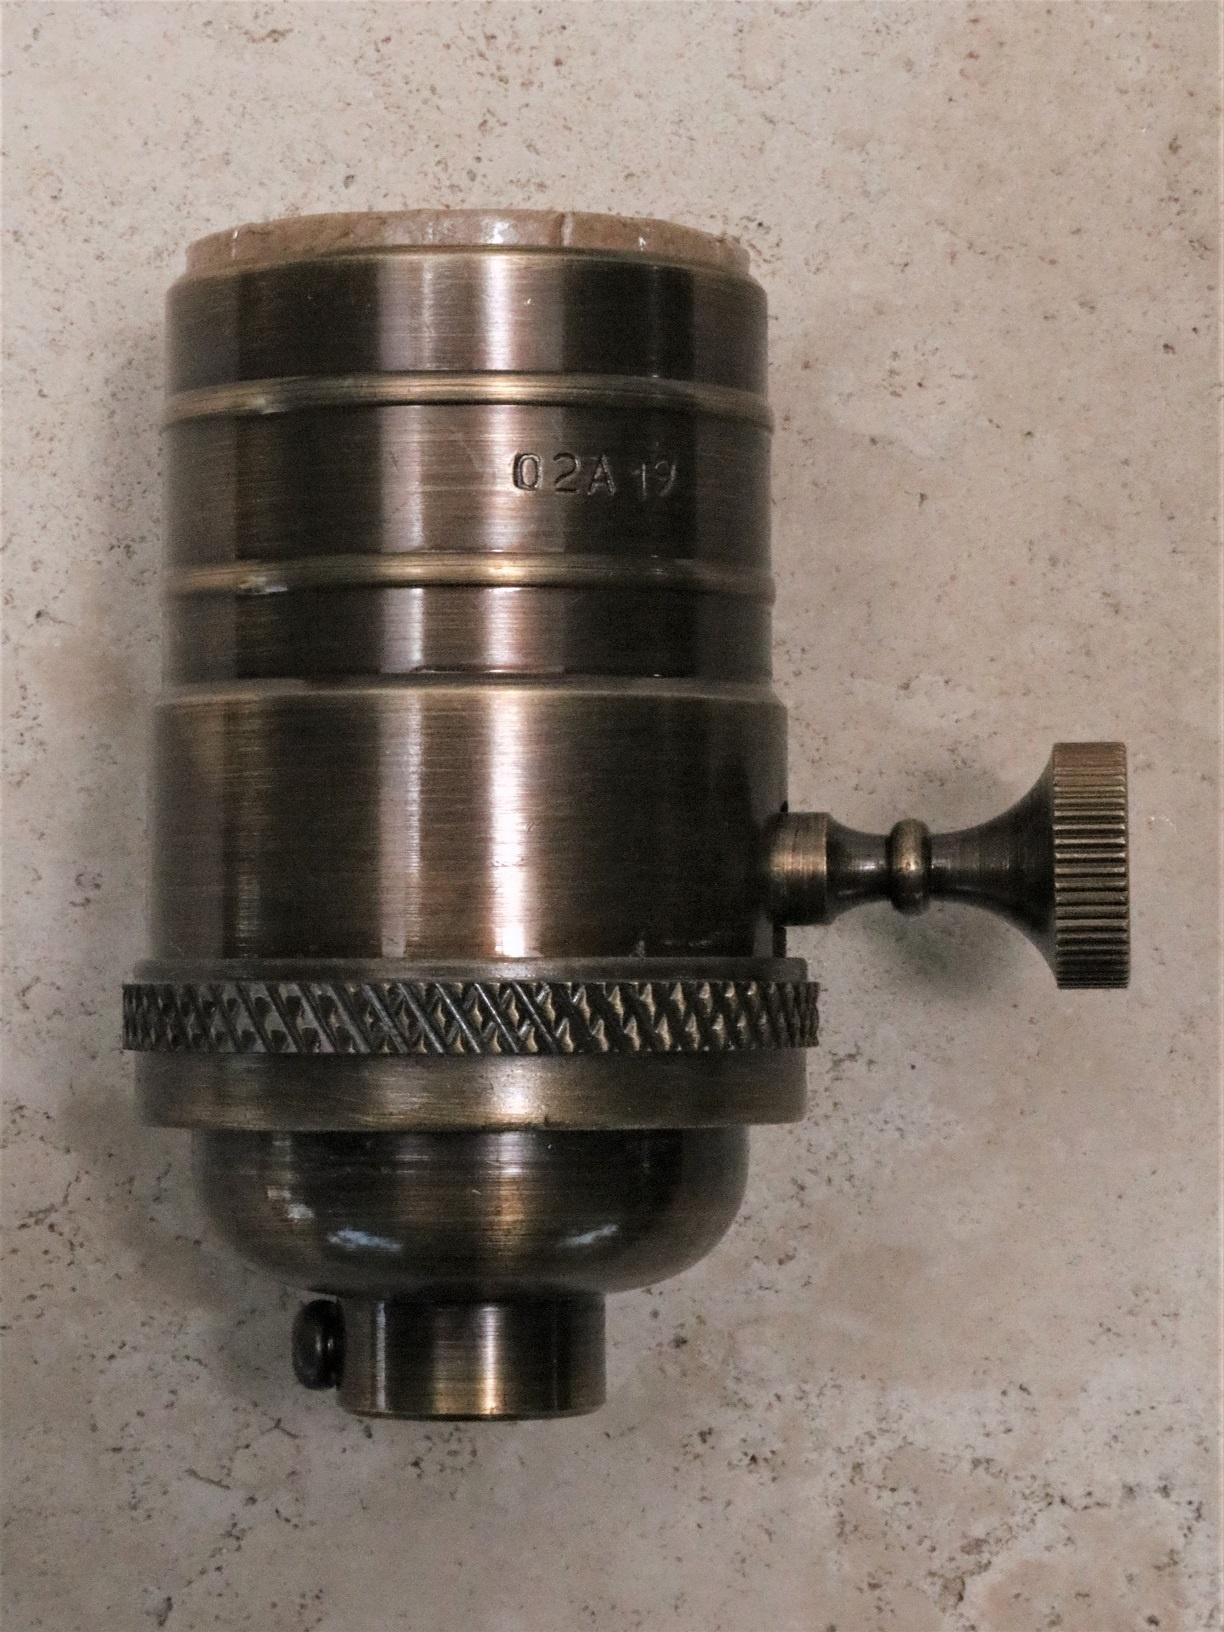 Replacement Lamp Socket Ferro Designs